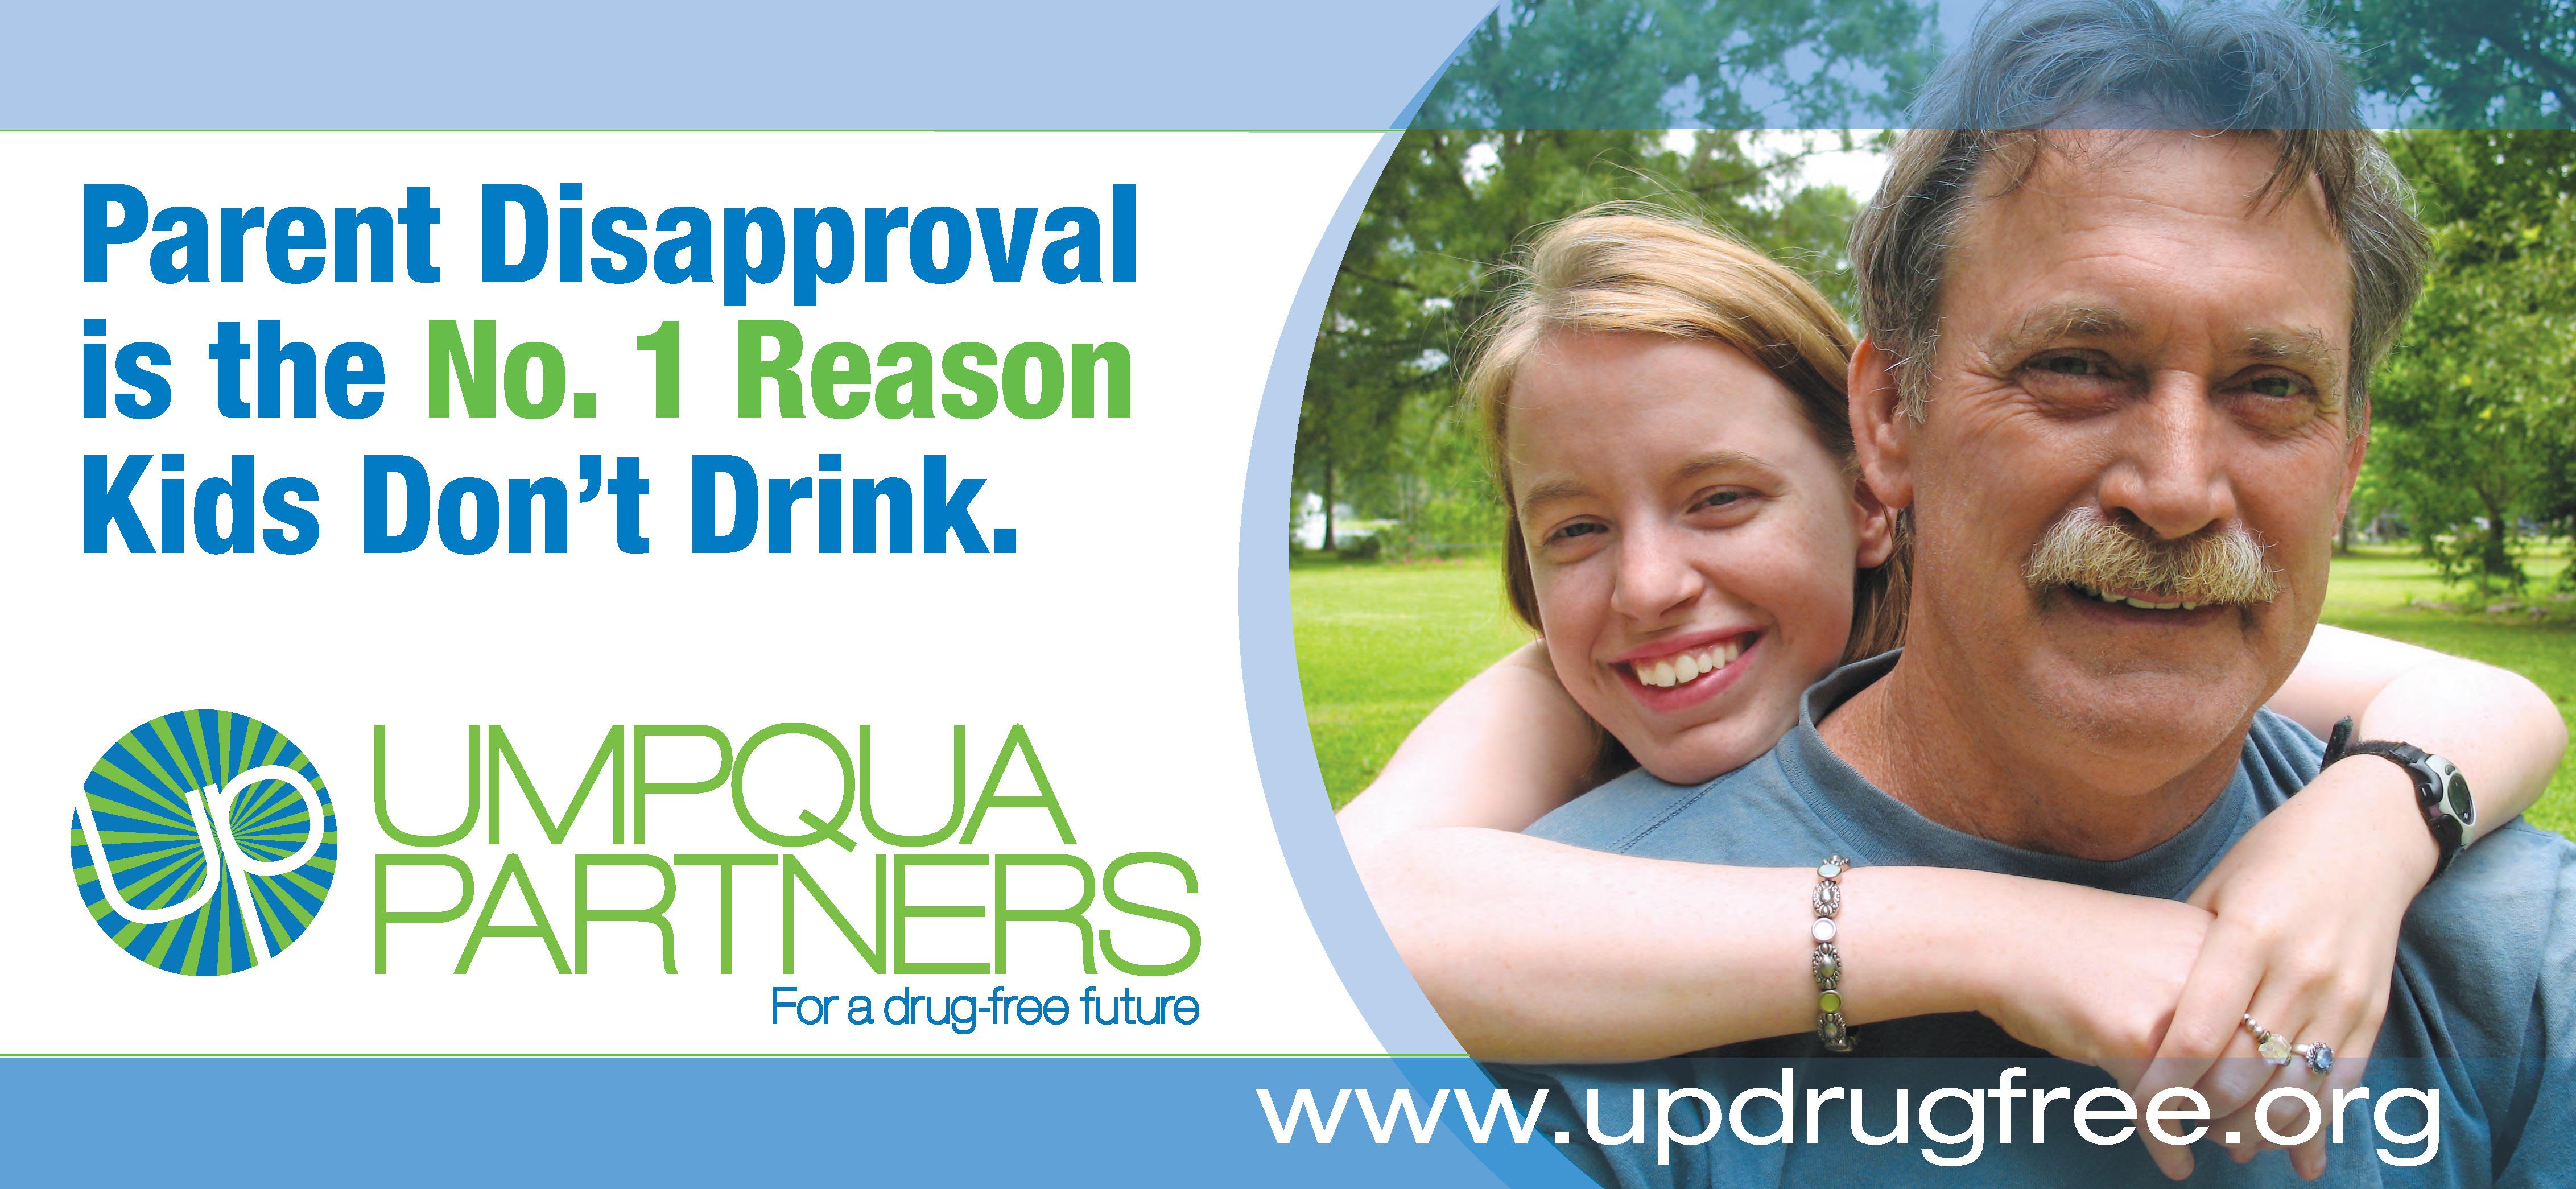 Umpqua Partners billboard